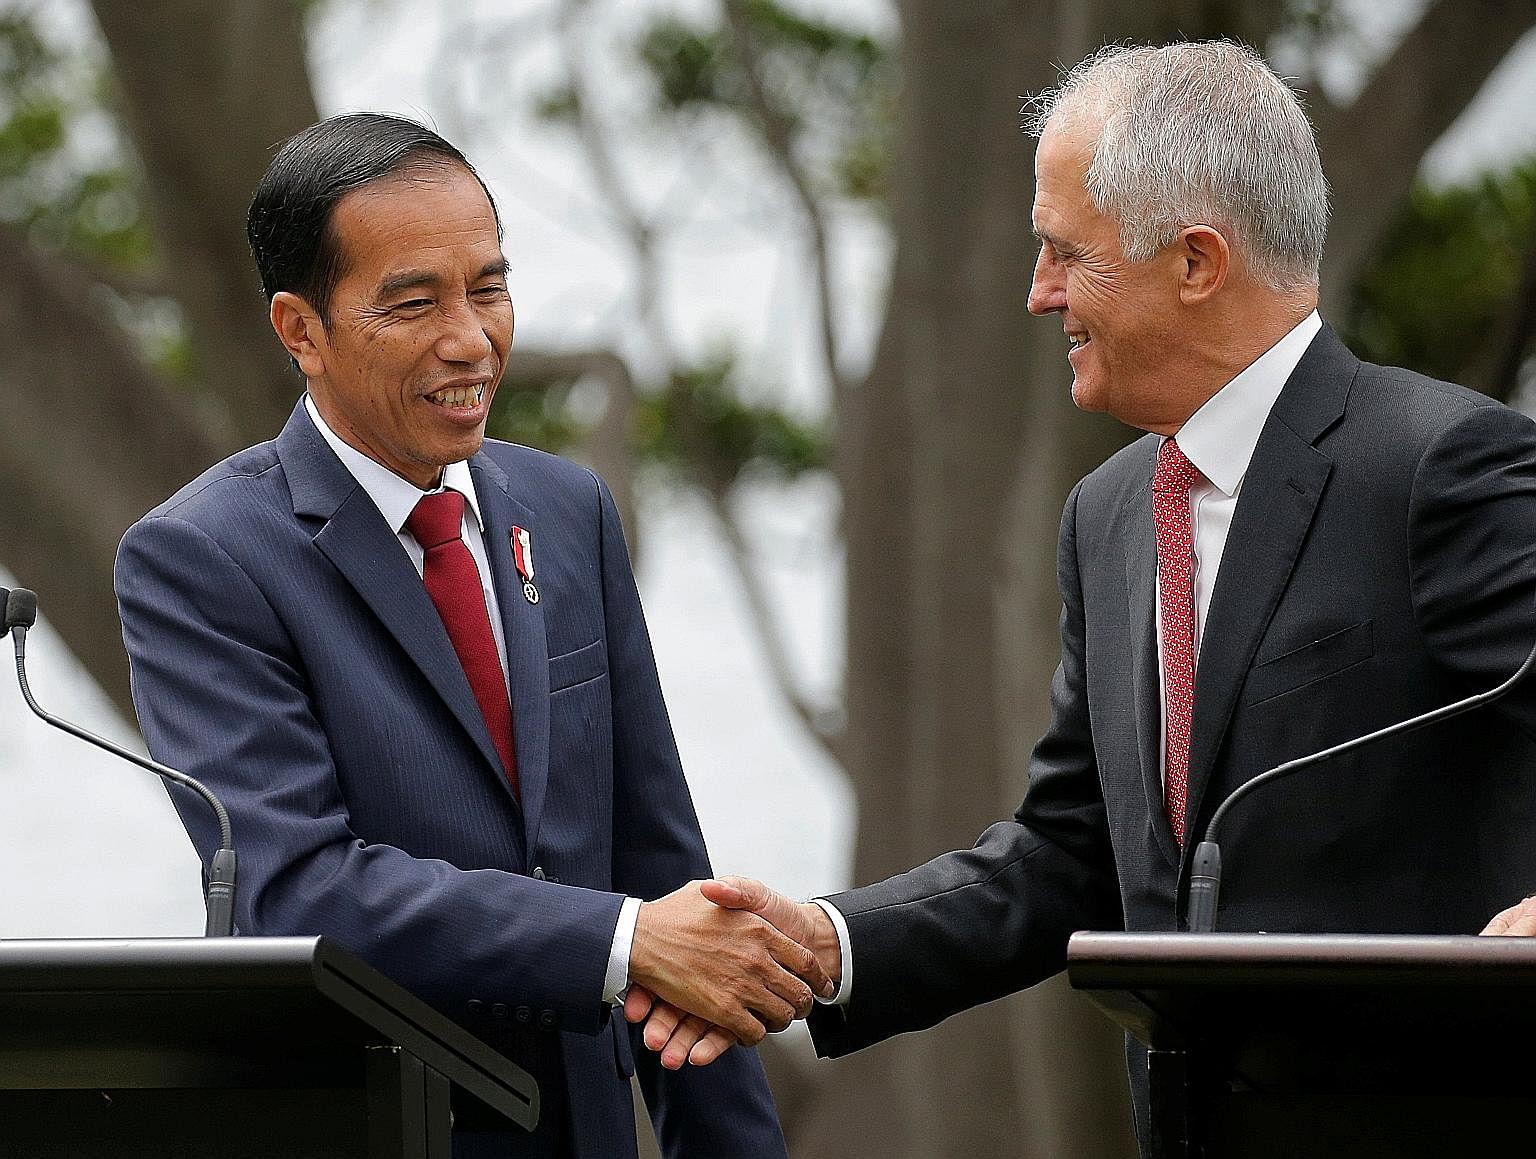 Indonesian President Joko Widodo and Australian Prime Minister Malcolm Turnbull in Sydney yesterday.